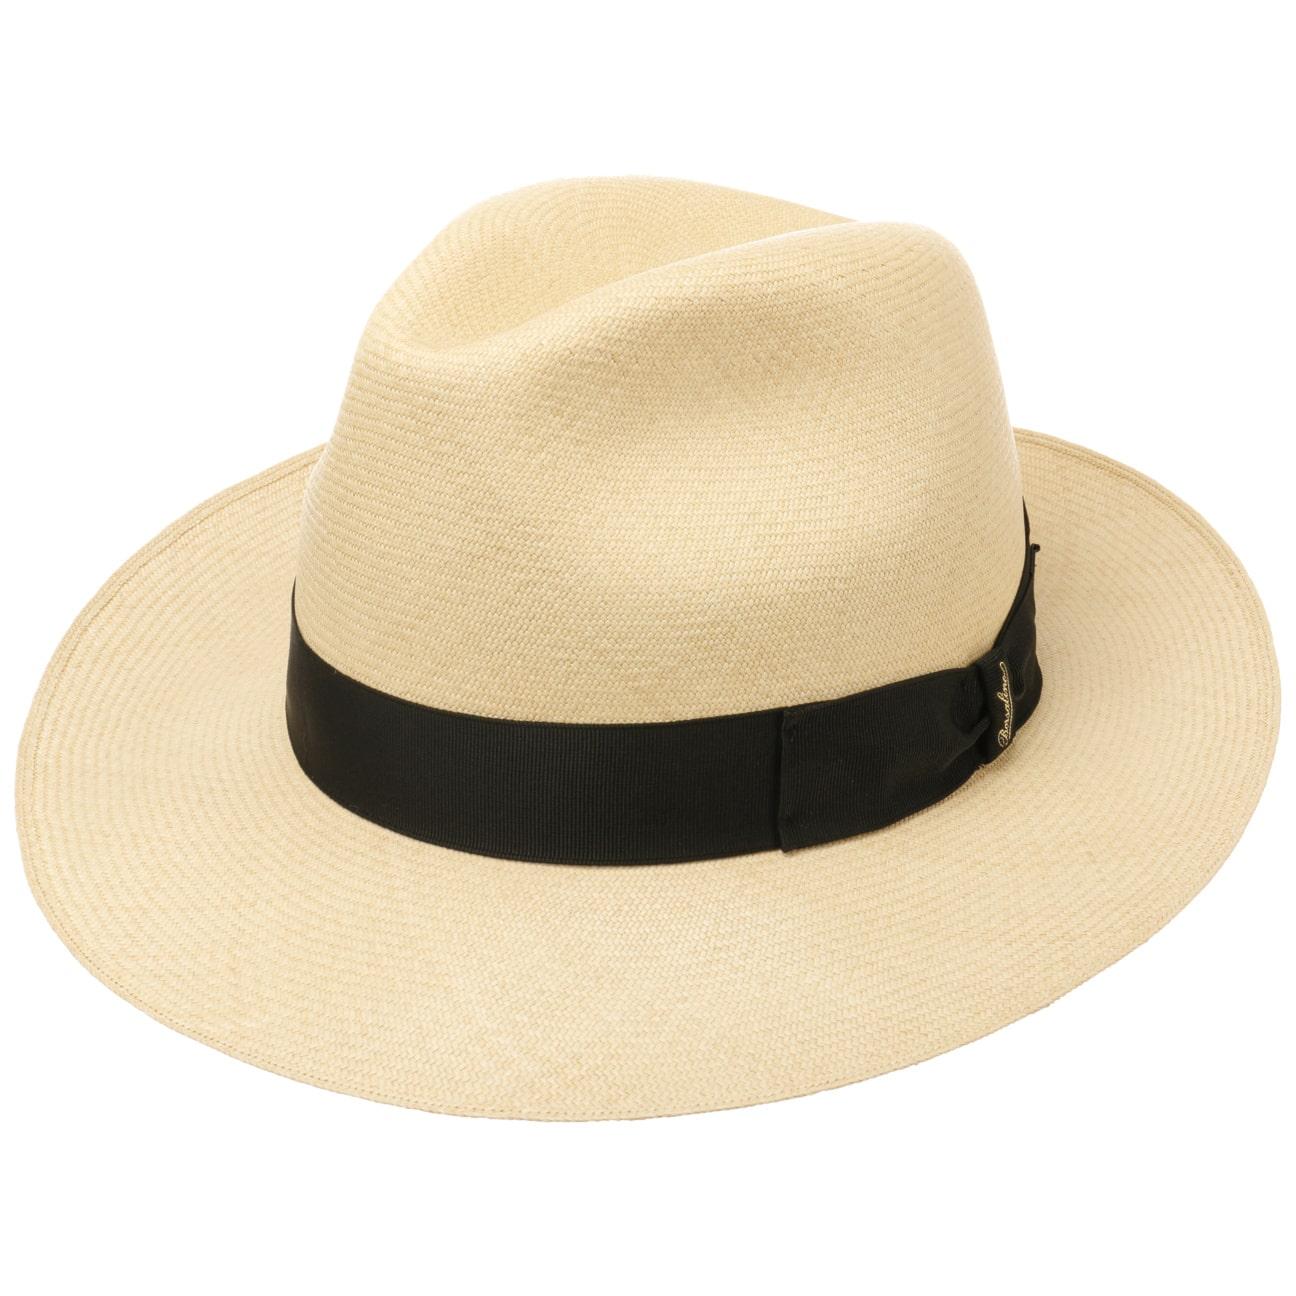 Sombrero Bogart Panam? Premium by Borsalino  sombrero de sol